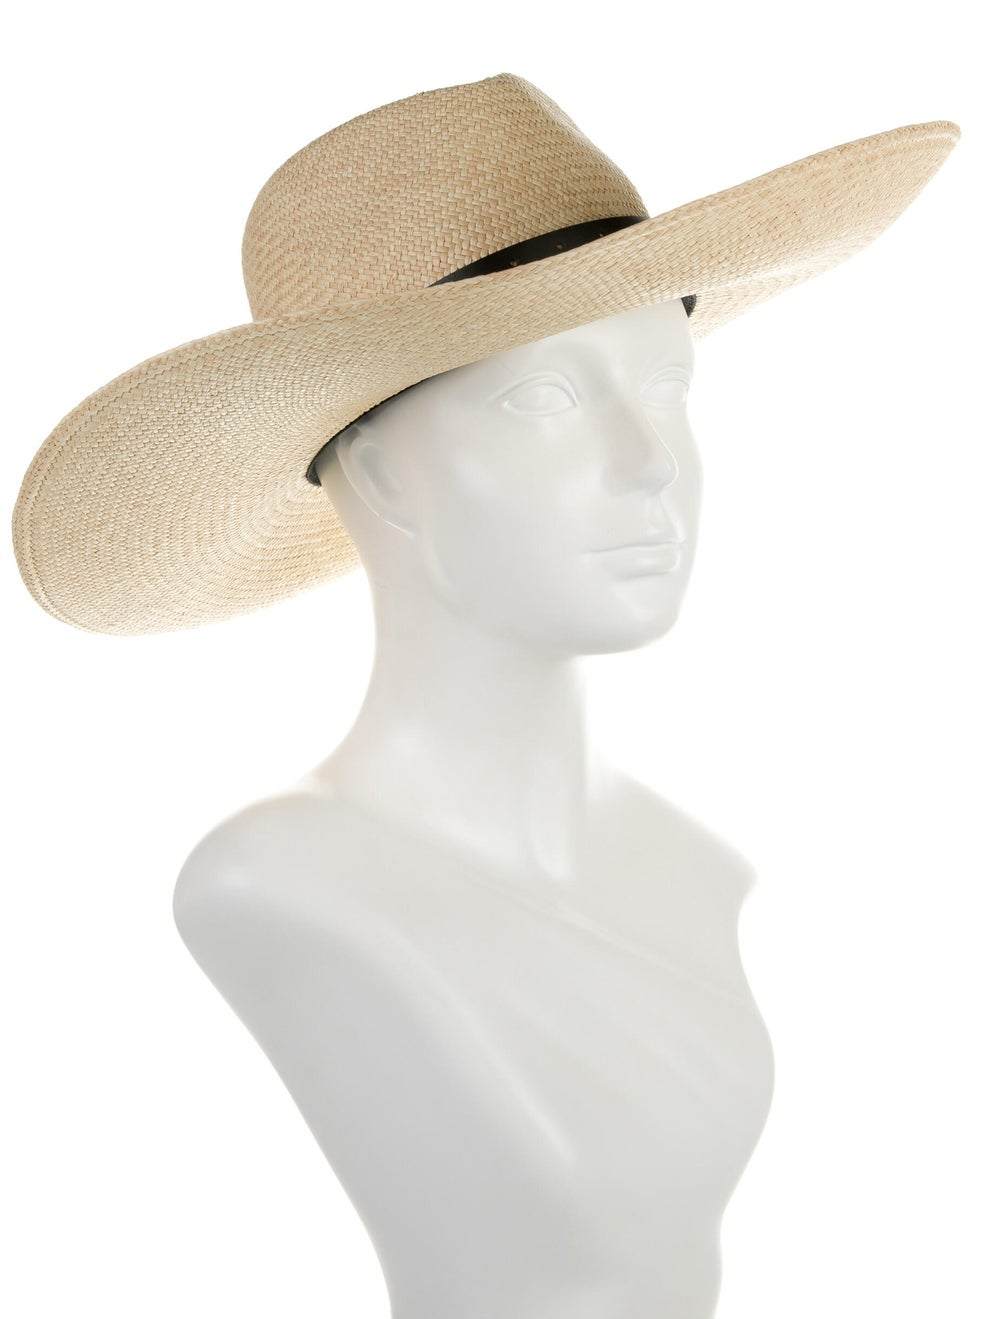 Rag & Bone Wide Brim Straw Hat Tan - image 3